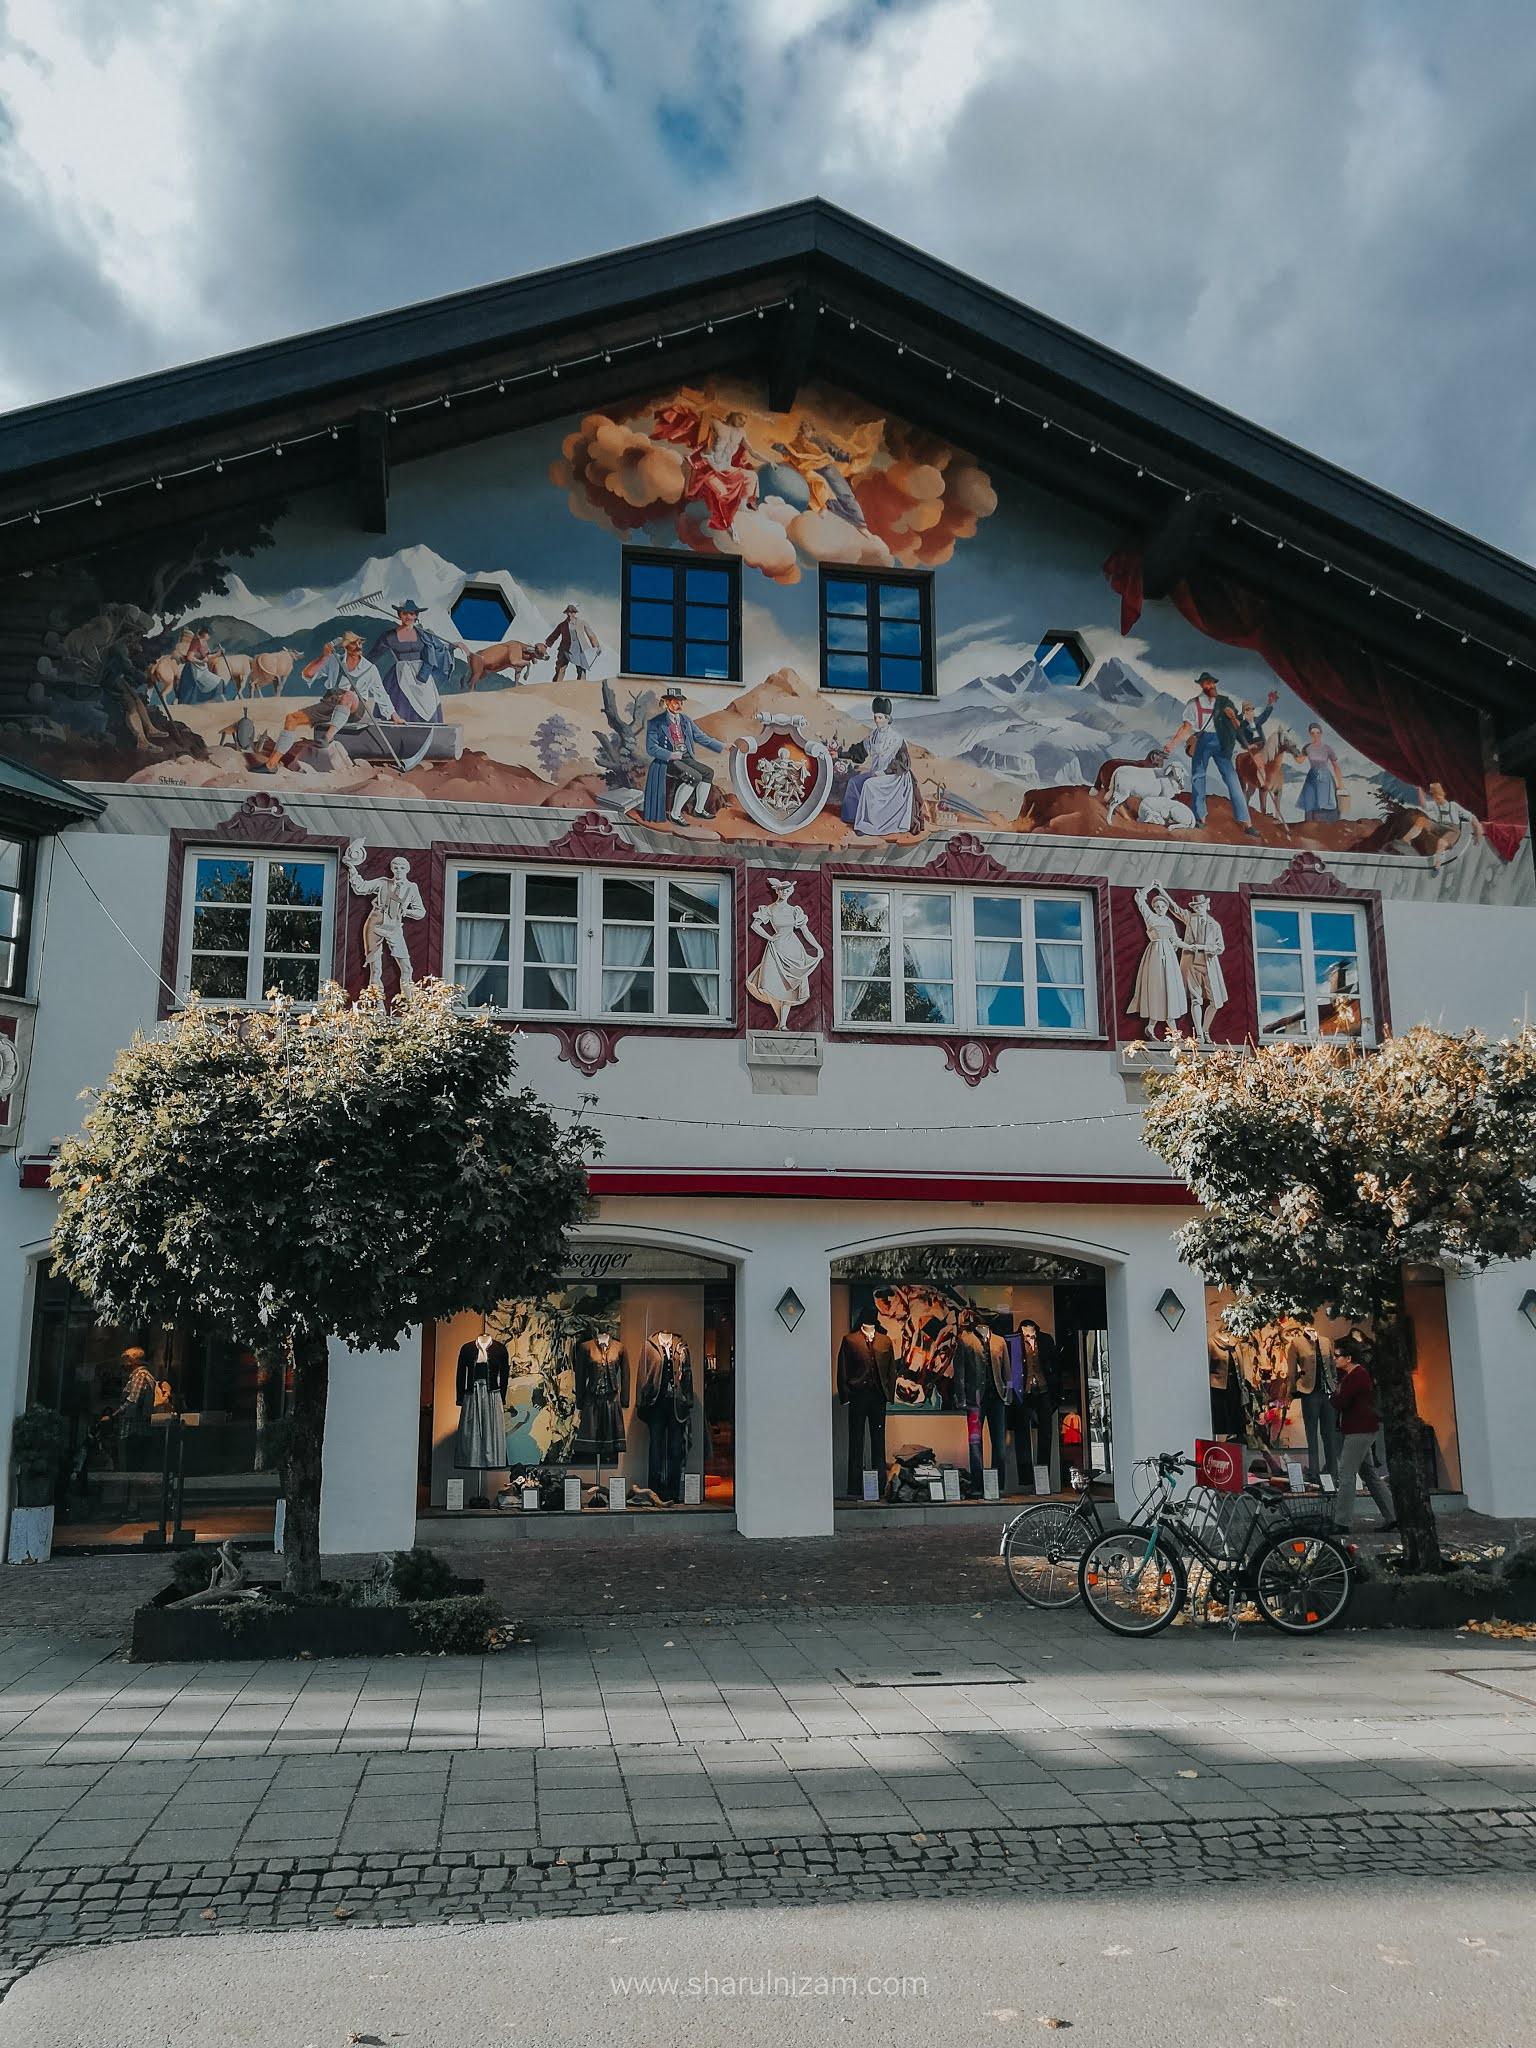 Makan Tengah Hari & Solat Di Garmisch Partenkirchen